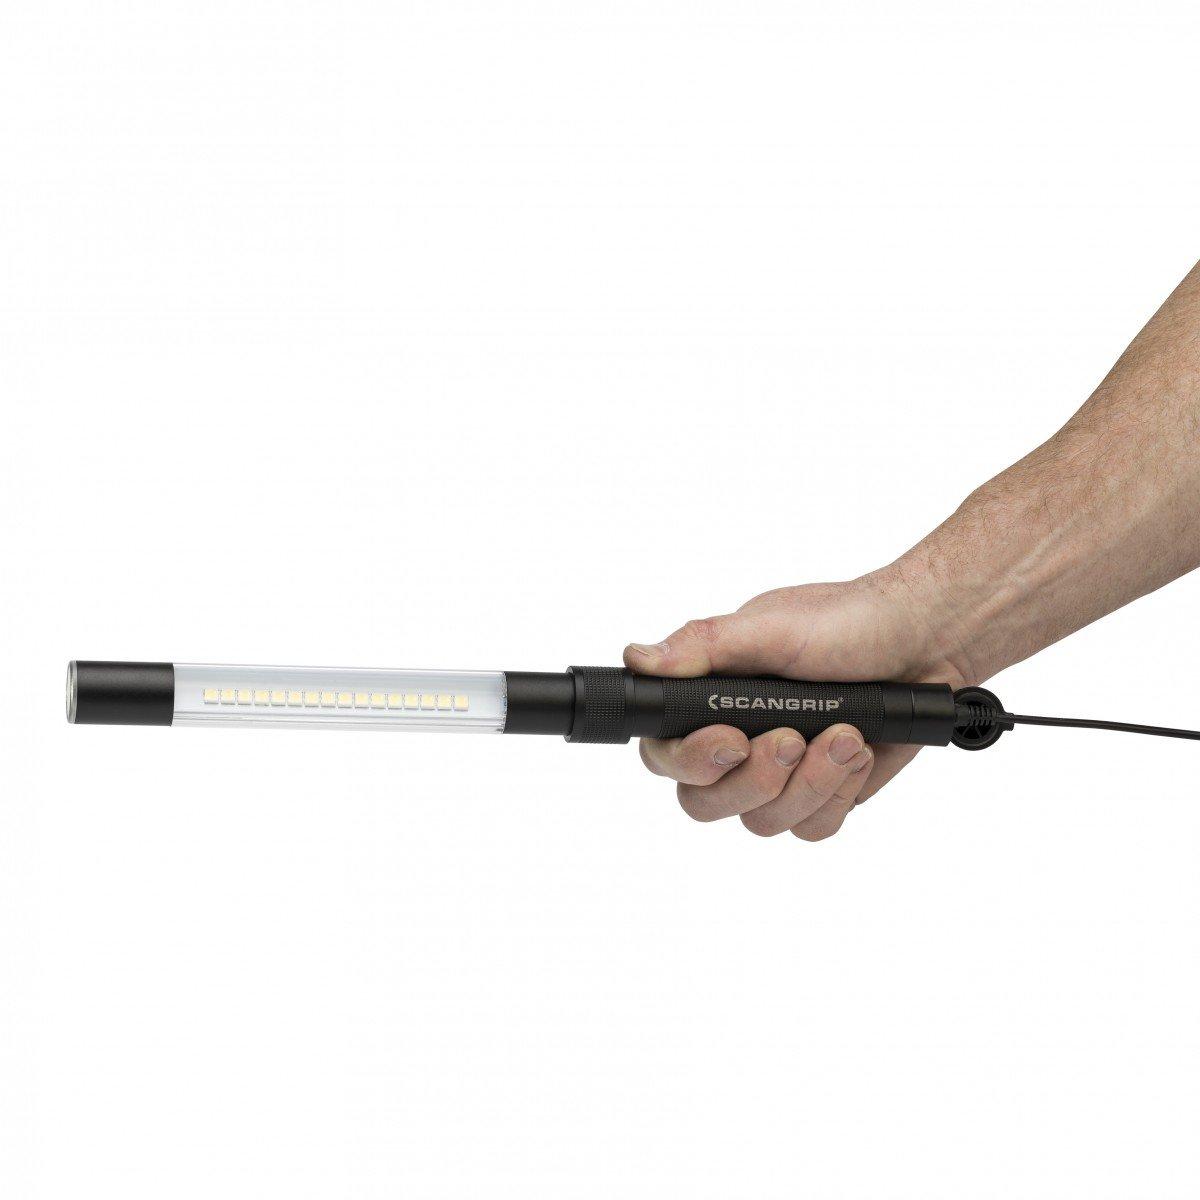 Scangrip Akku-Handleuchte LED 03.5244